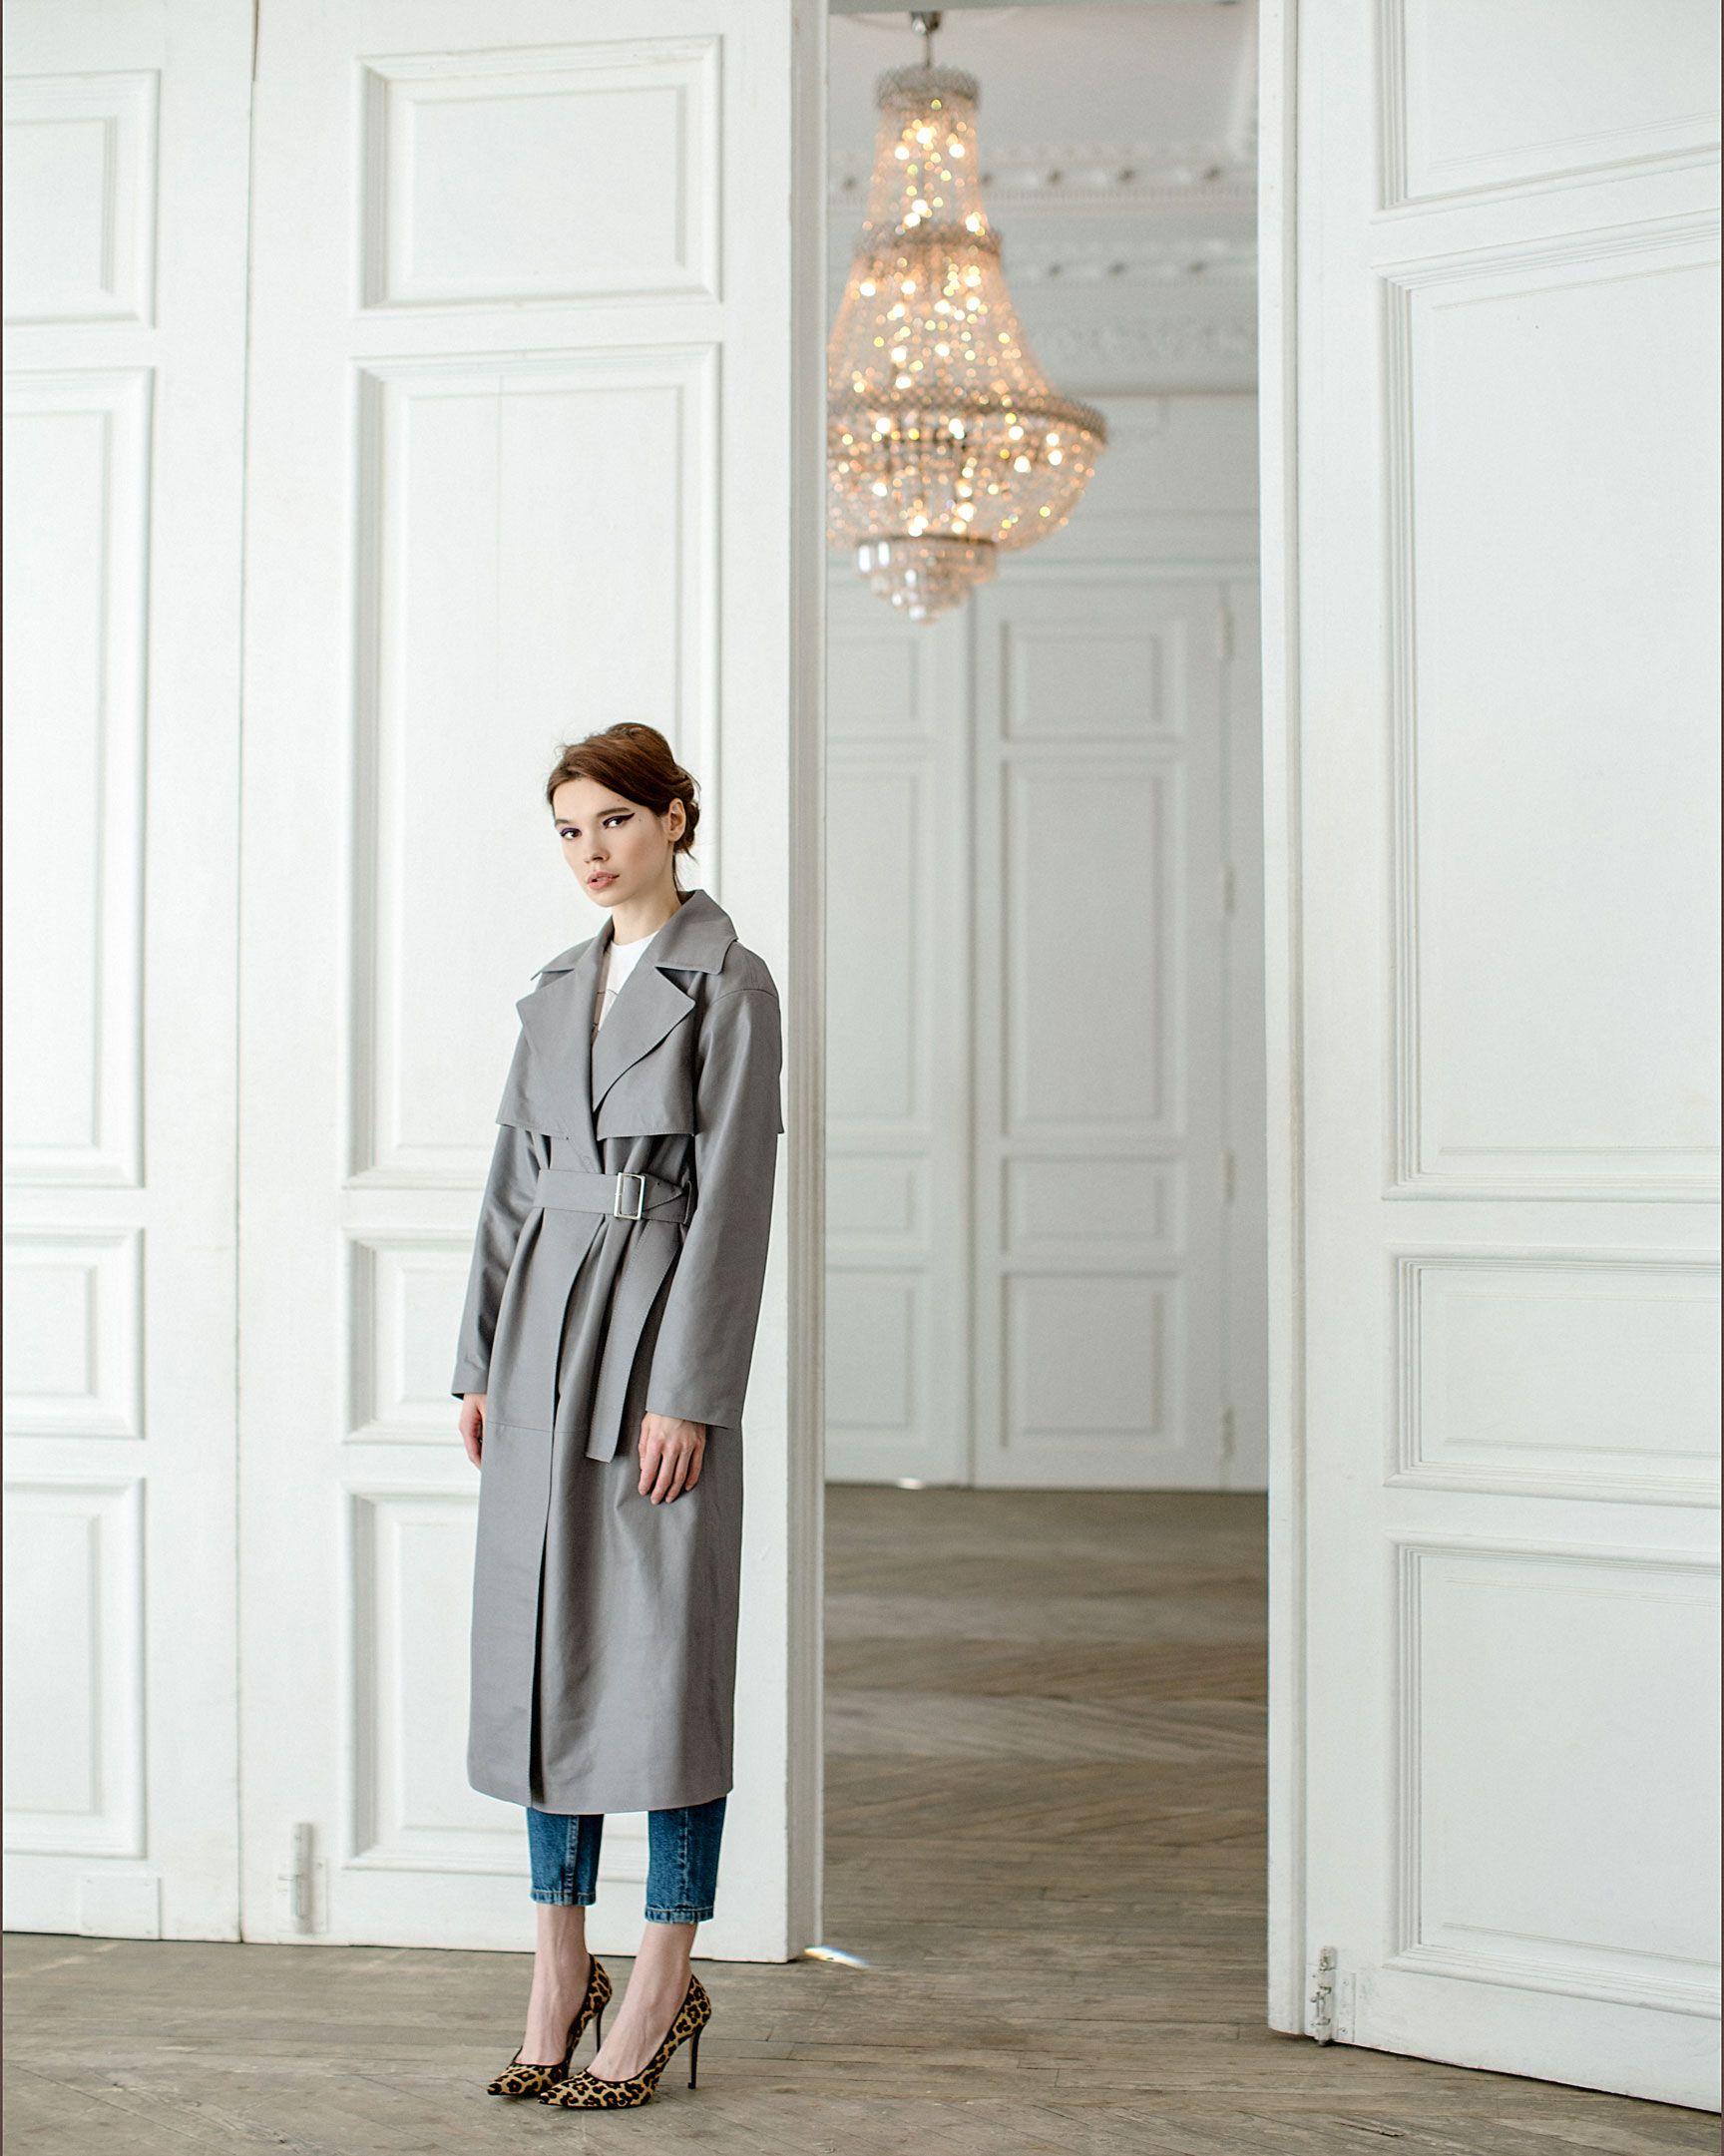 модель лукбук fashion stylist, Анастасия Денисенко